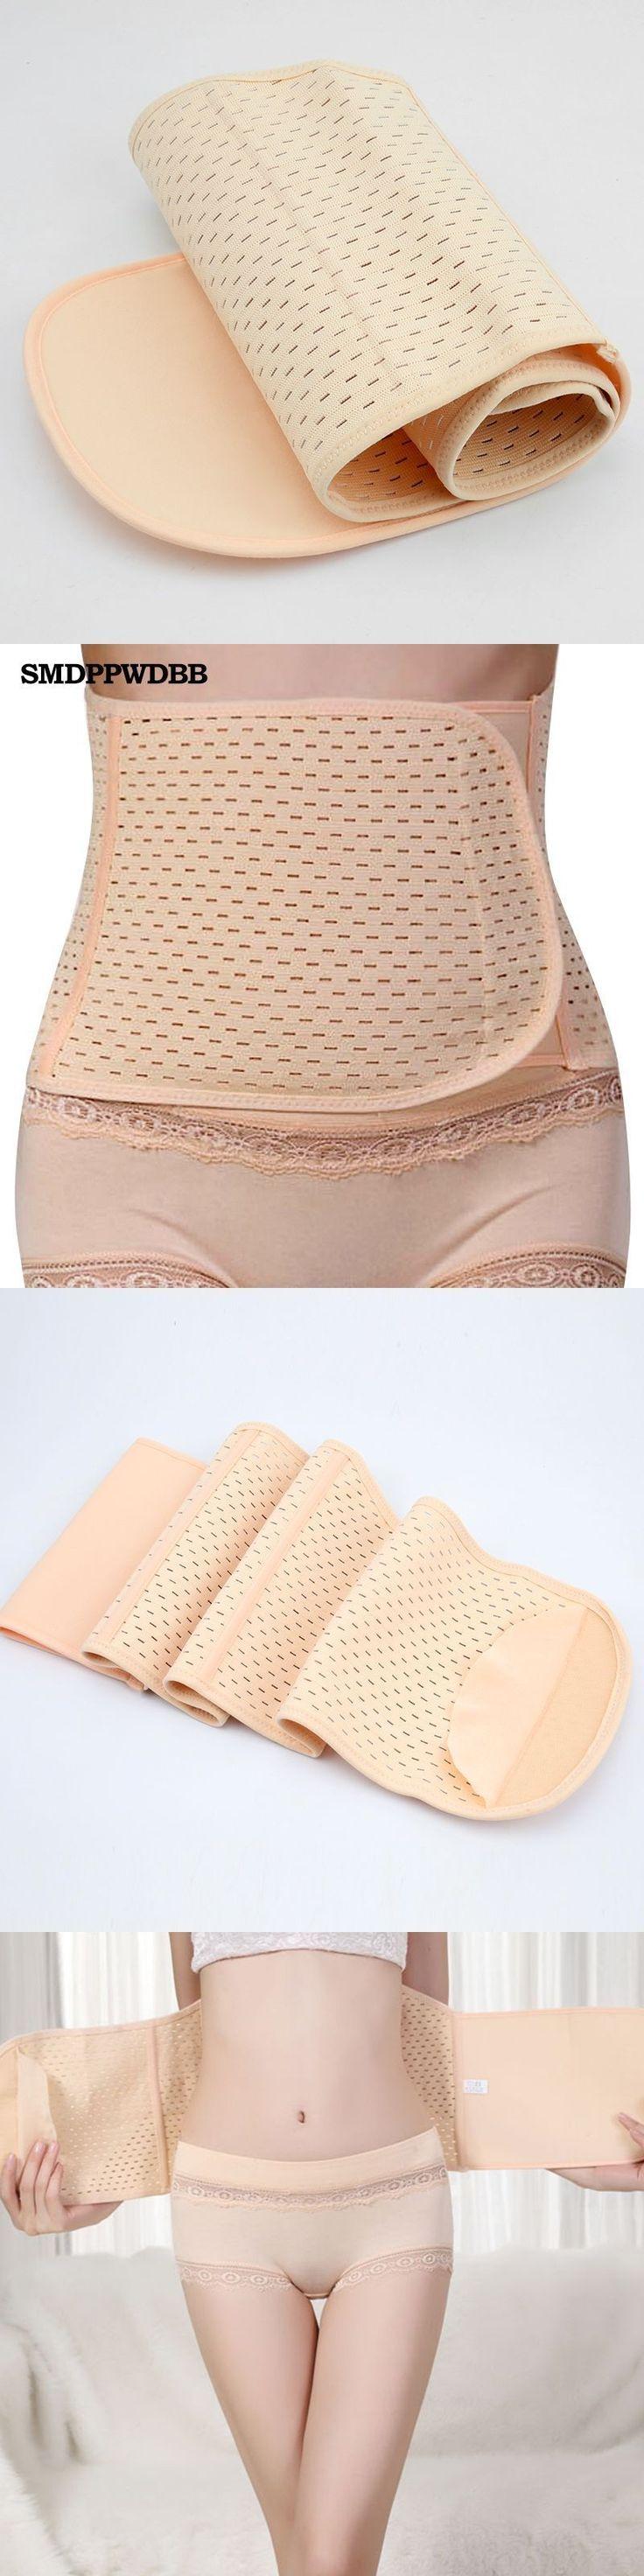 Postpartum Belly Band After Pregnancy Belt Belly Belt Maternity Postpartum Bandage Band for Pregnant Women Shapewear Reducers #pregnancybellyband #pregnancybelt,